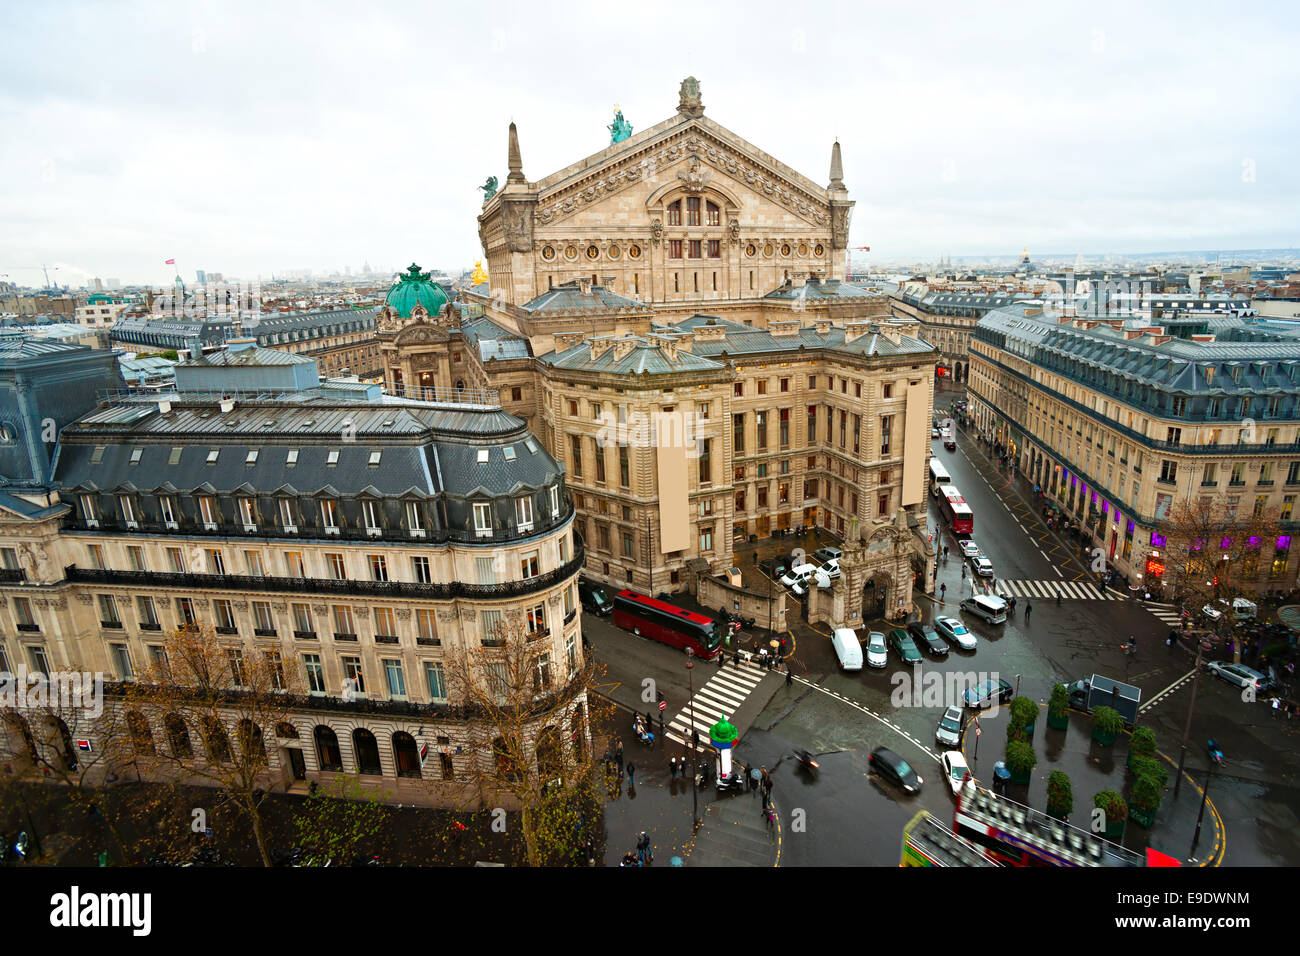 view of opera Garnier, Paris, France. - Stock Image